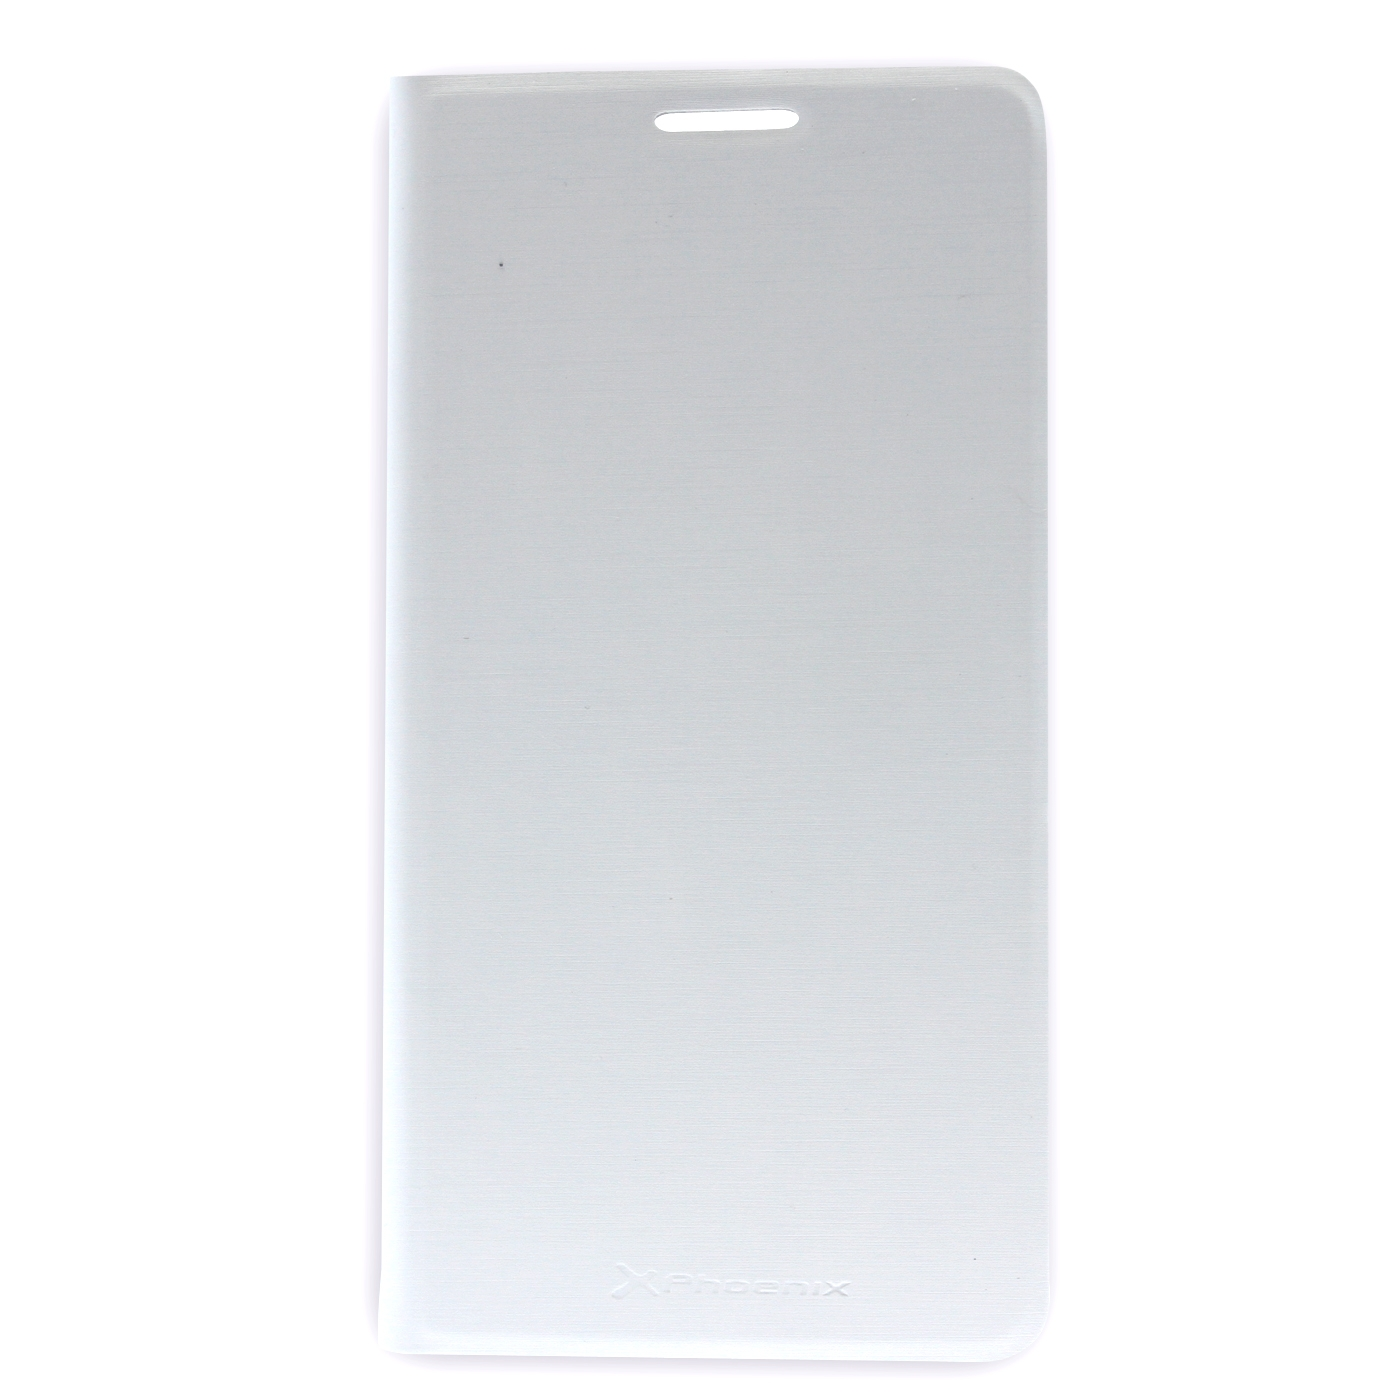 Funda Slim Cover Case Phoenix Para Telefono Smartphone 4.5 Pulgadas Rock Mini Blanca PHROCKXMINICASE